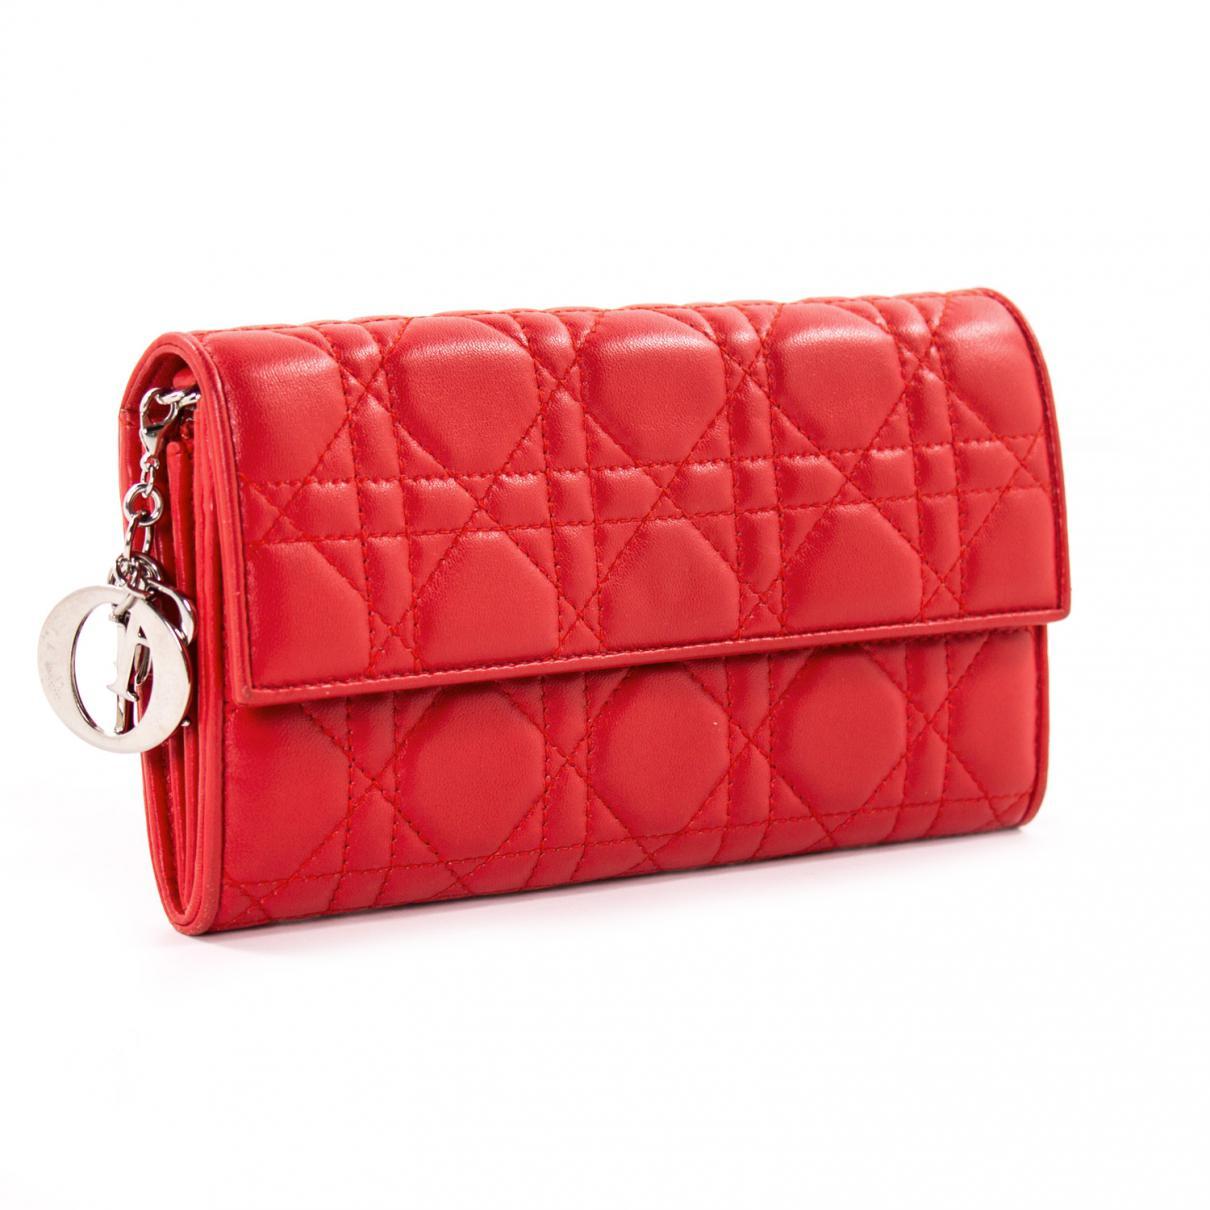 cc72a6b580aff4 Dior - Red Leather Clutch Bag - Lyst. View fullscreen